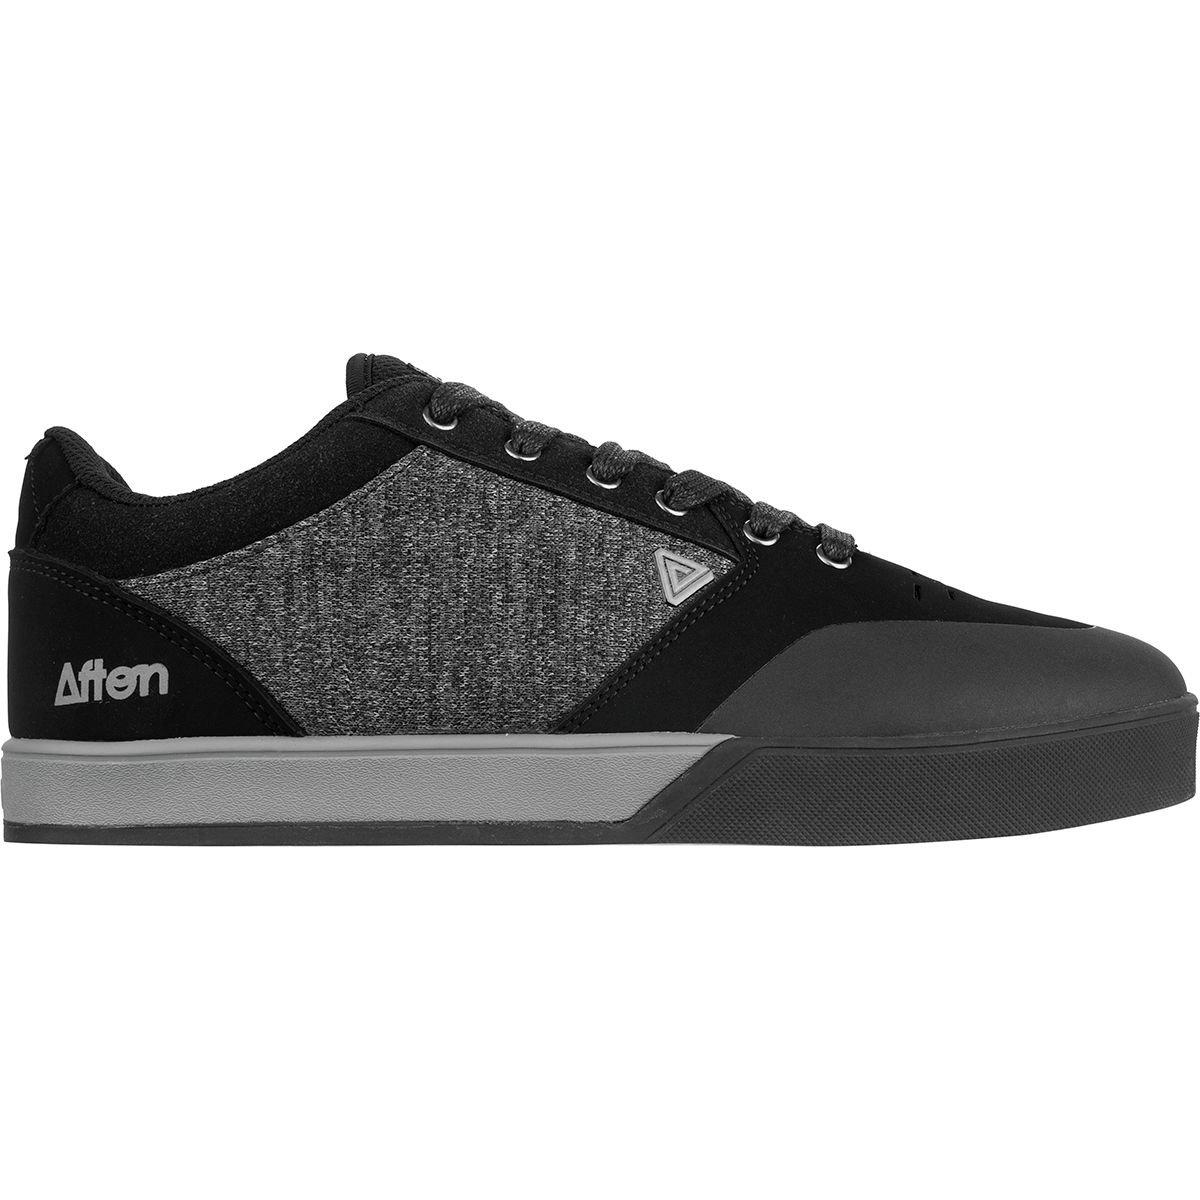 Afton Keegan Shoe – Men 's Black/Heathered、10.0   B07C8BWB7S